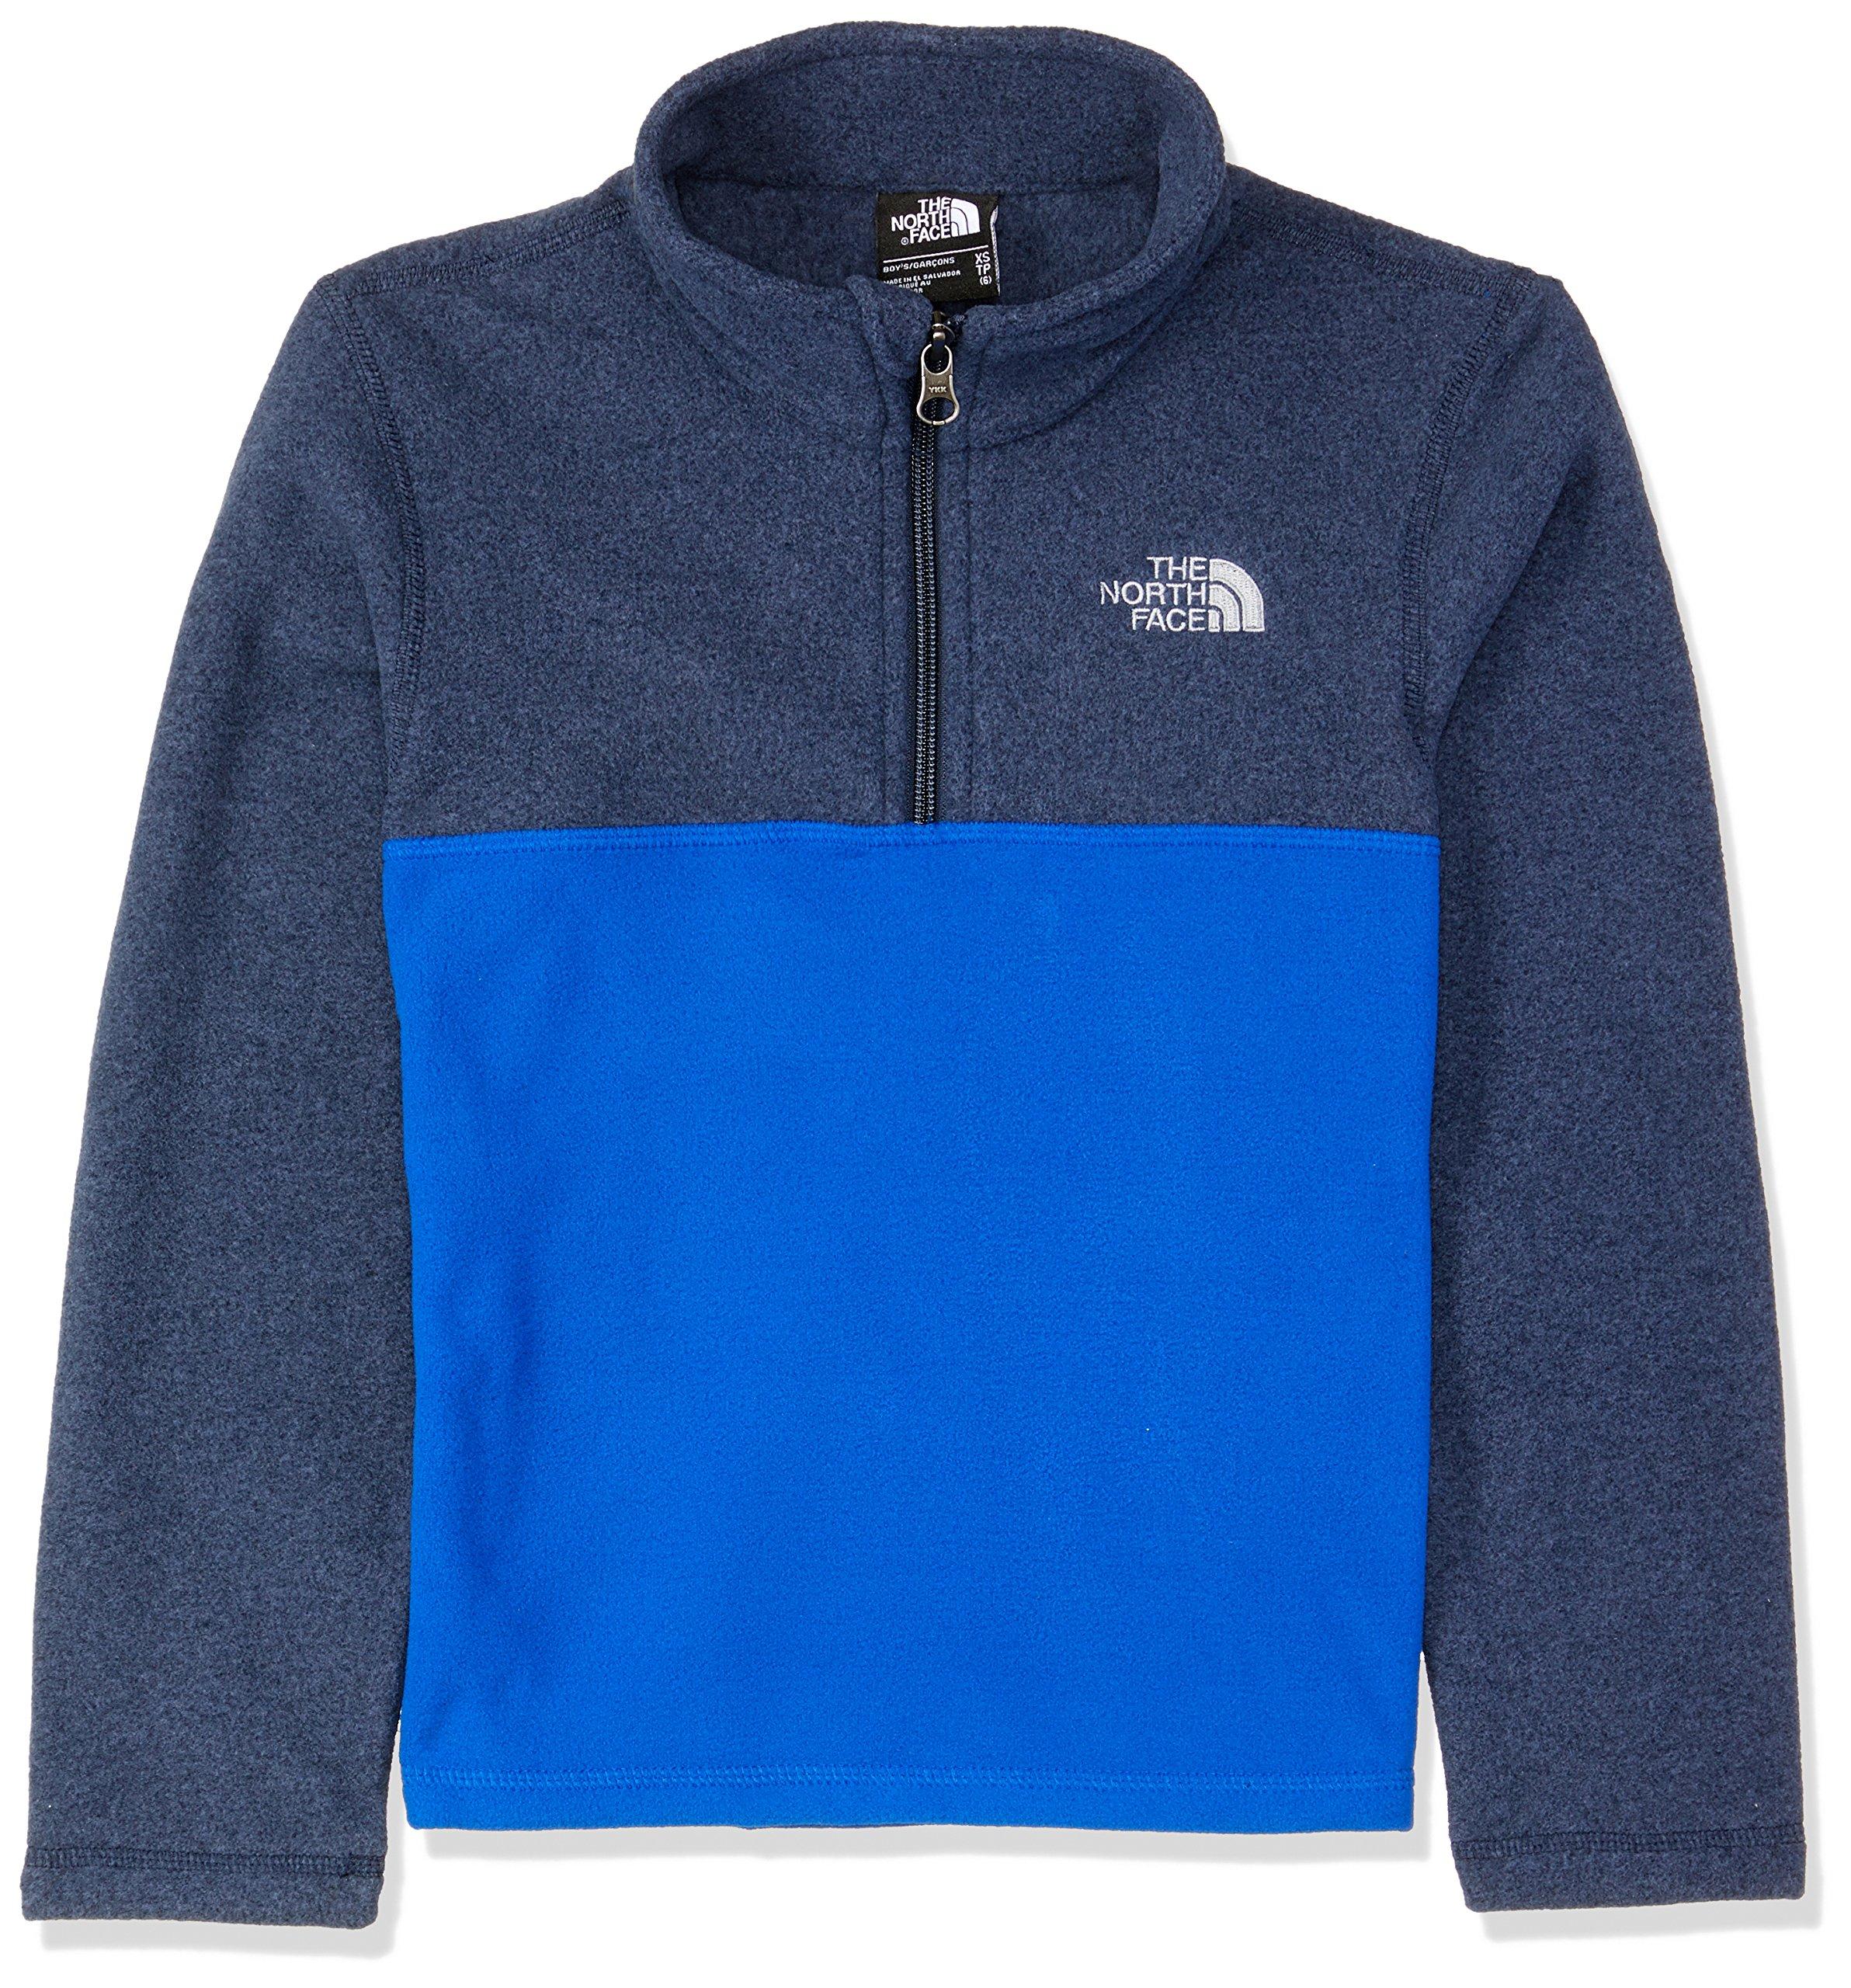 The North Face Boy's Glacier 1/4 Zip Fleece Pullover - Bright Cobalt Blue - L (Past Season)